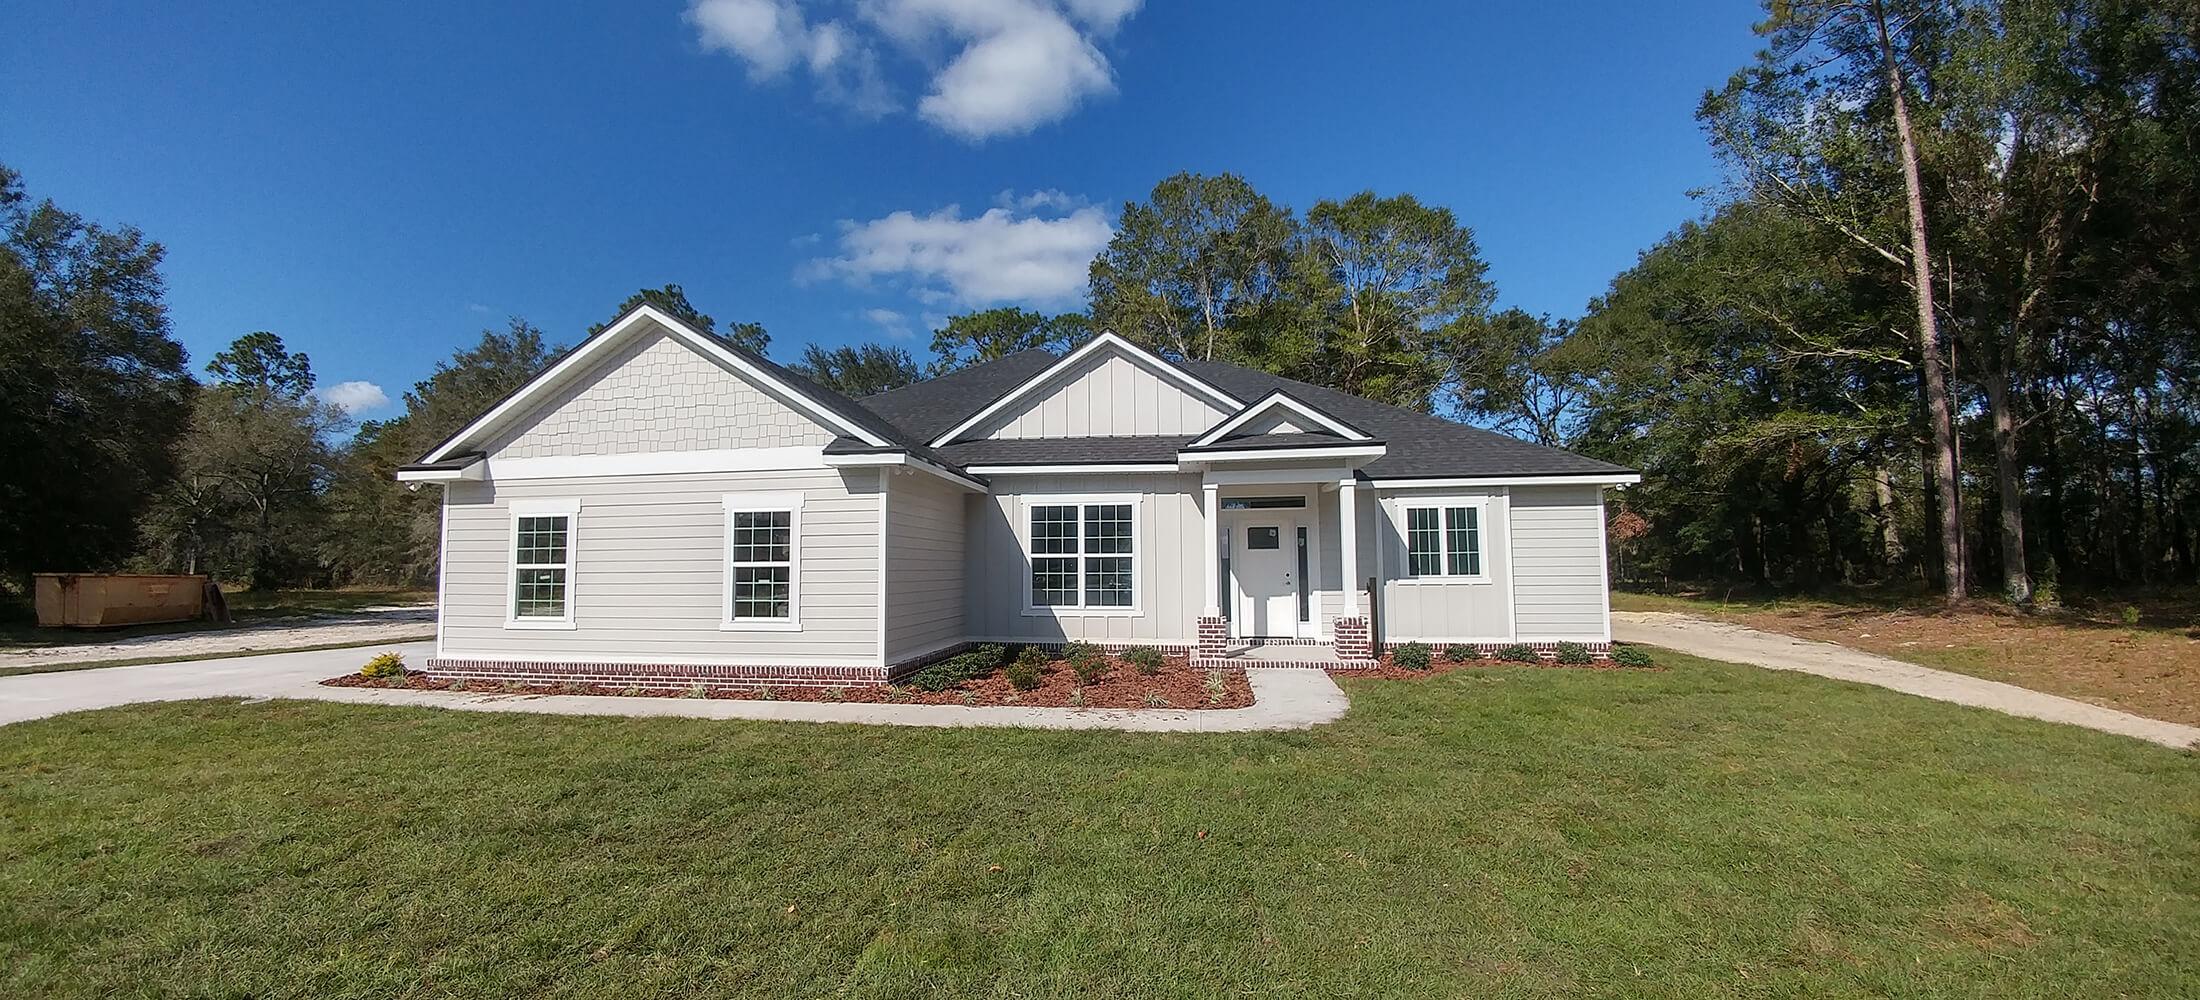 Lake City FL Real Estate   Lake City FL Homes for Sale